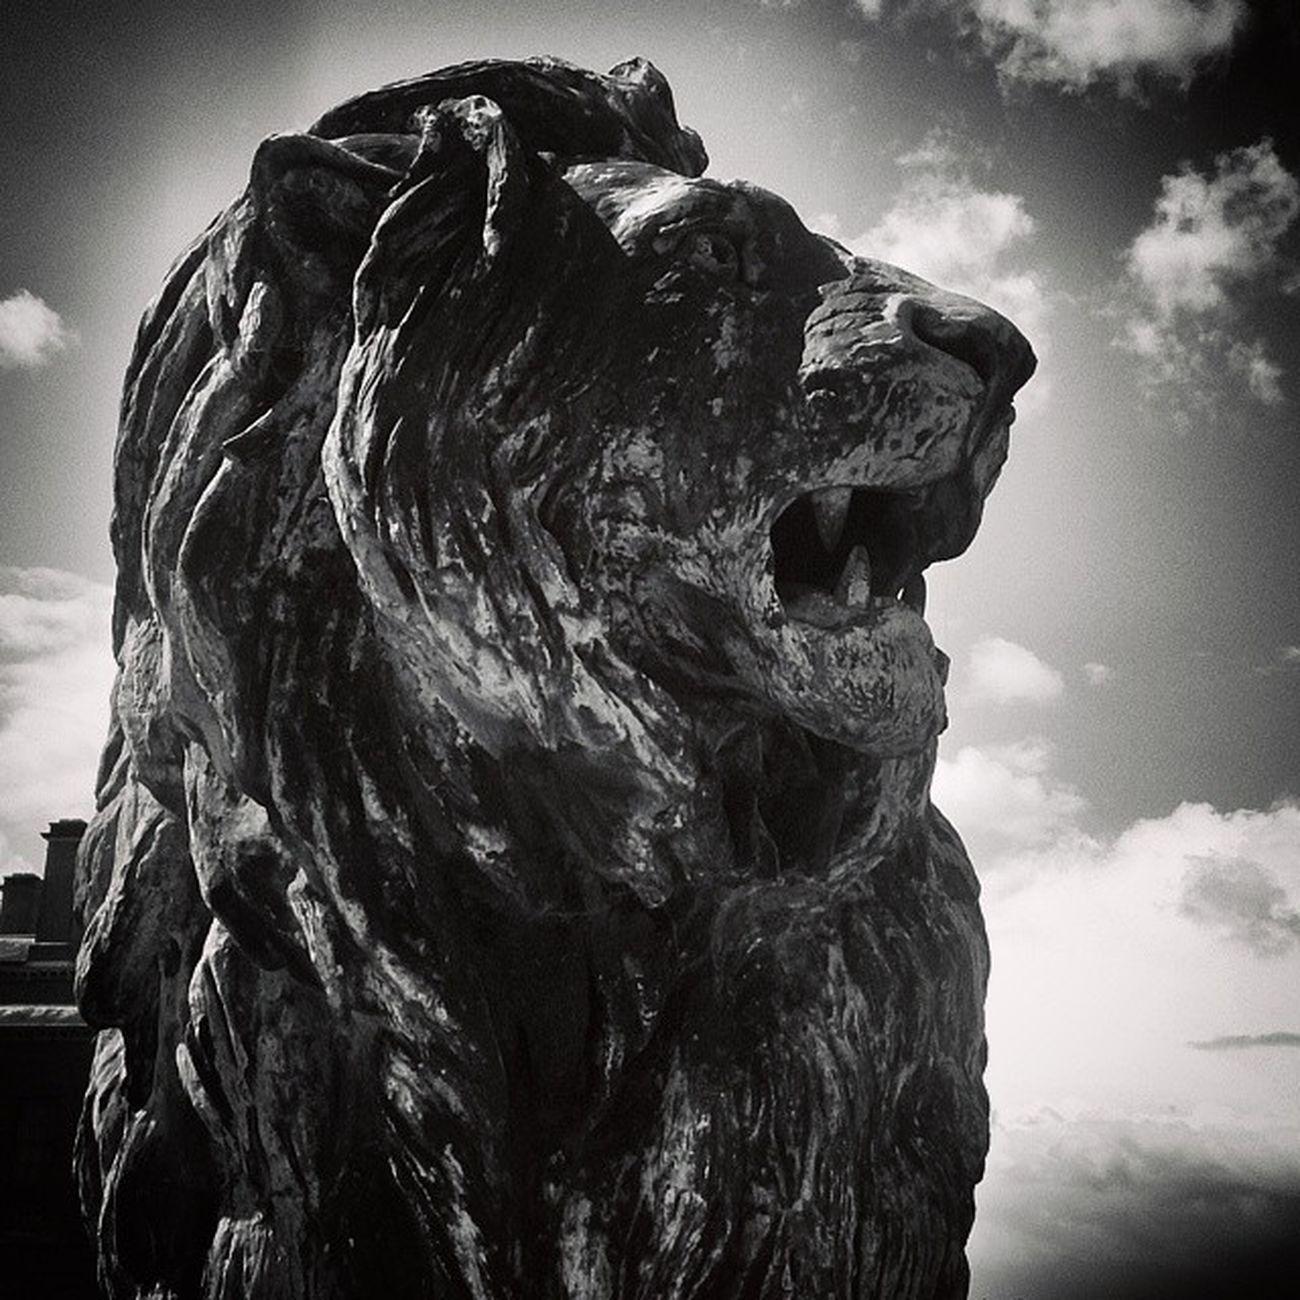 Holkham Holkhamhall Lion Statues statueporn statue lion archilovers architecture architectureporn architexture architecturelovers archidaily artphoto_bw bnw_zone bnw_captures bnw_universe bnw_diamond bnw_hub bnw_wonderful bnw_worldwide BlackAndWhite blackandwhiteonly cloudporn skyporn BlackAndWhitePhotography blacknwhite_perfection bnw_life bnw_sniper bnw